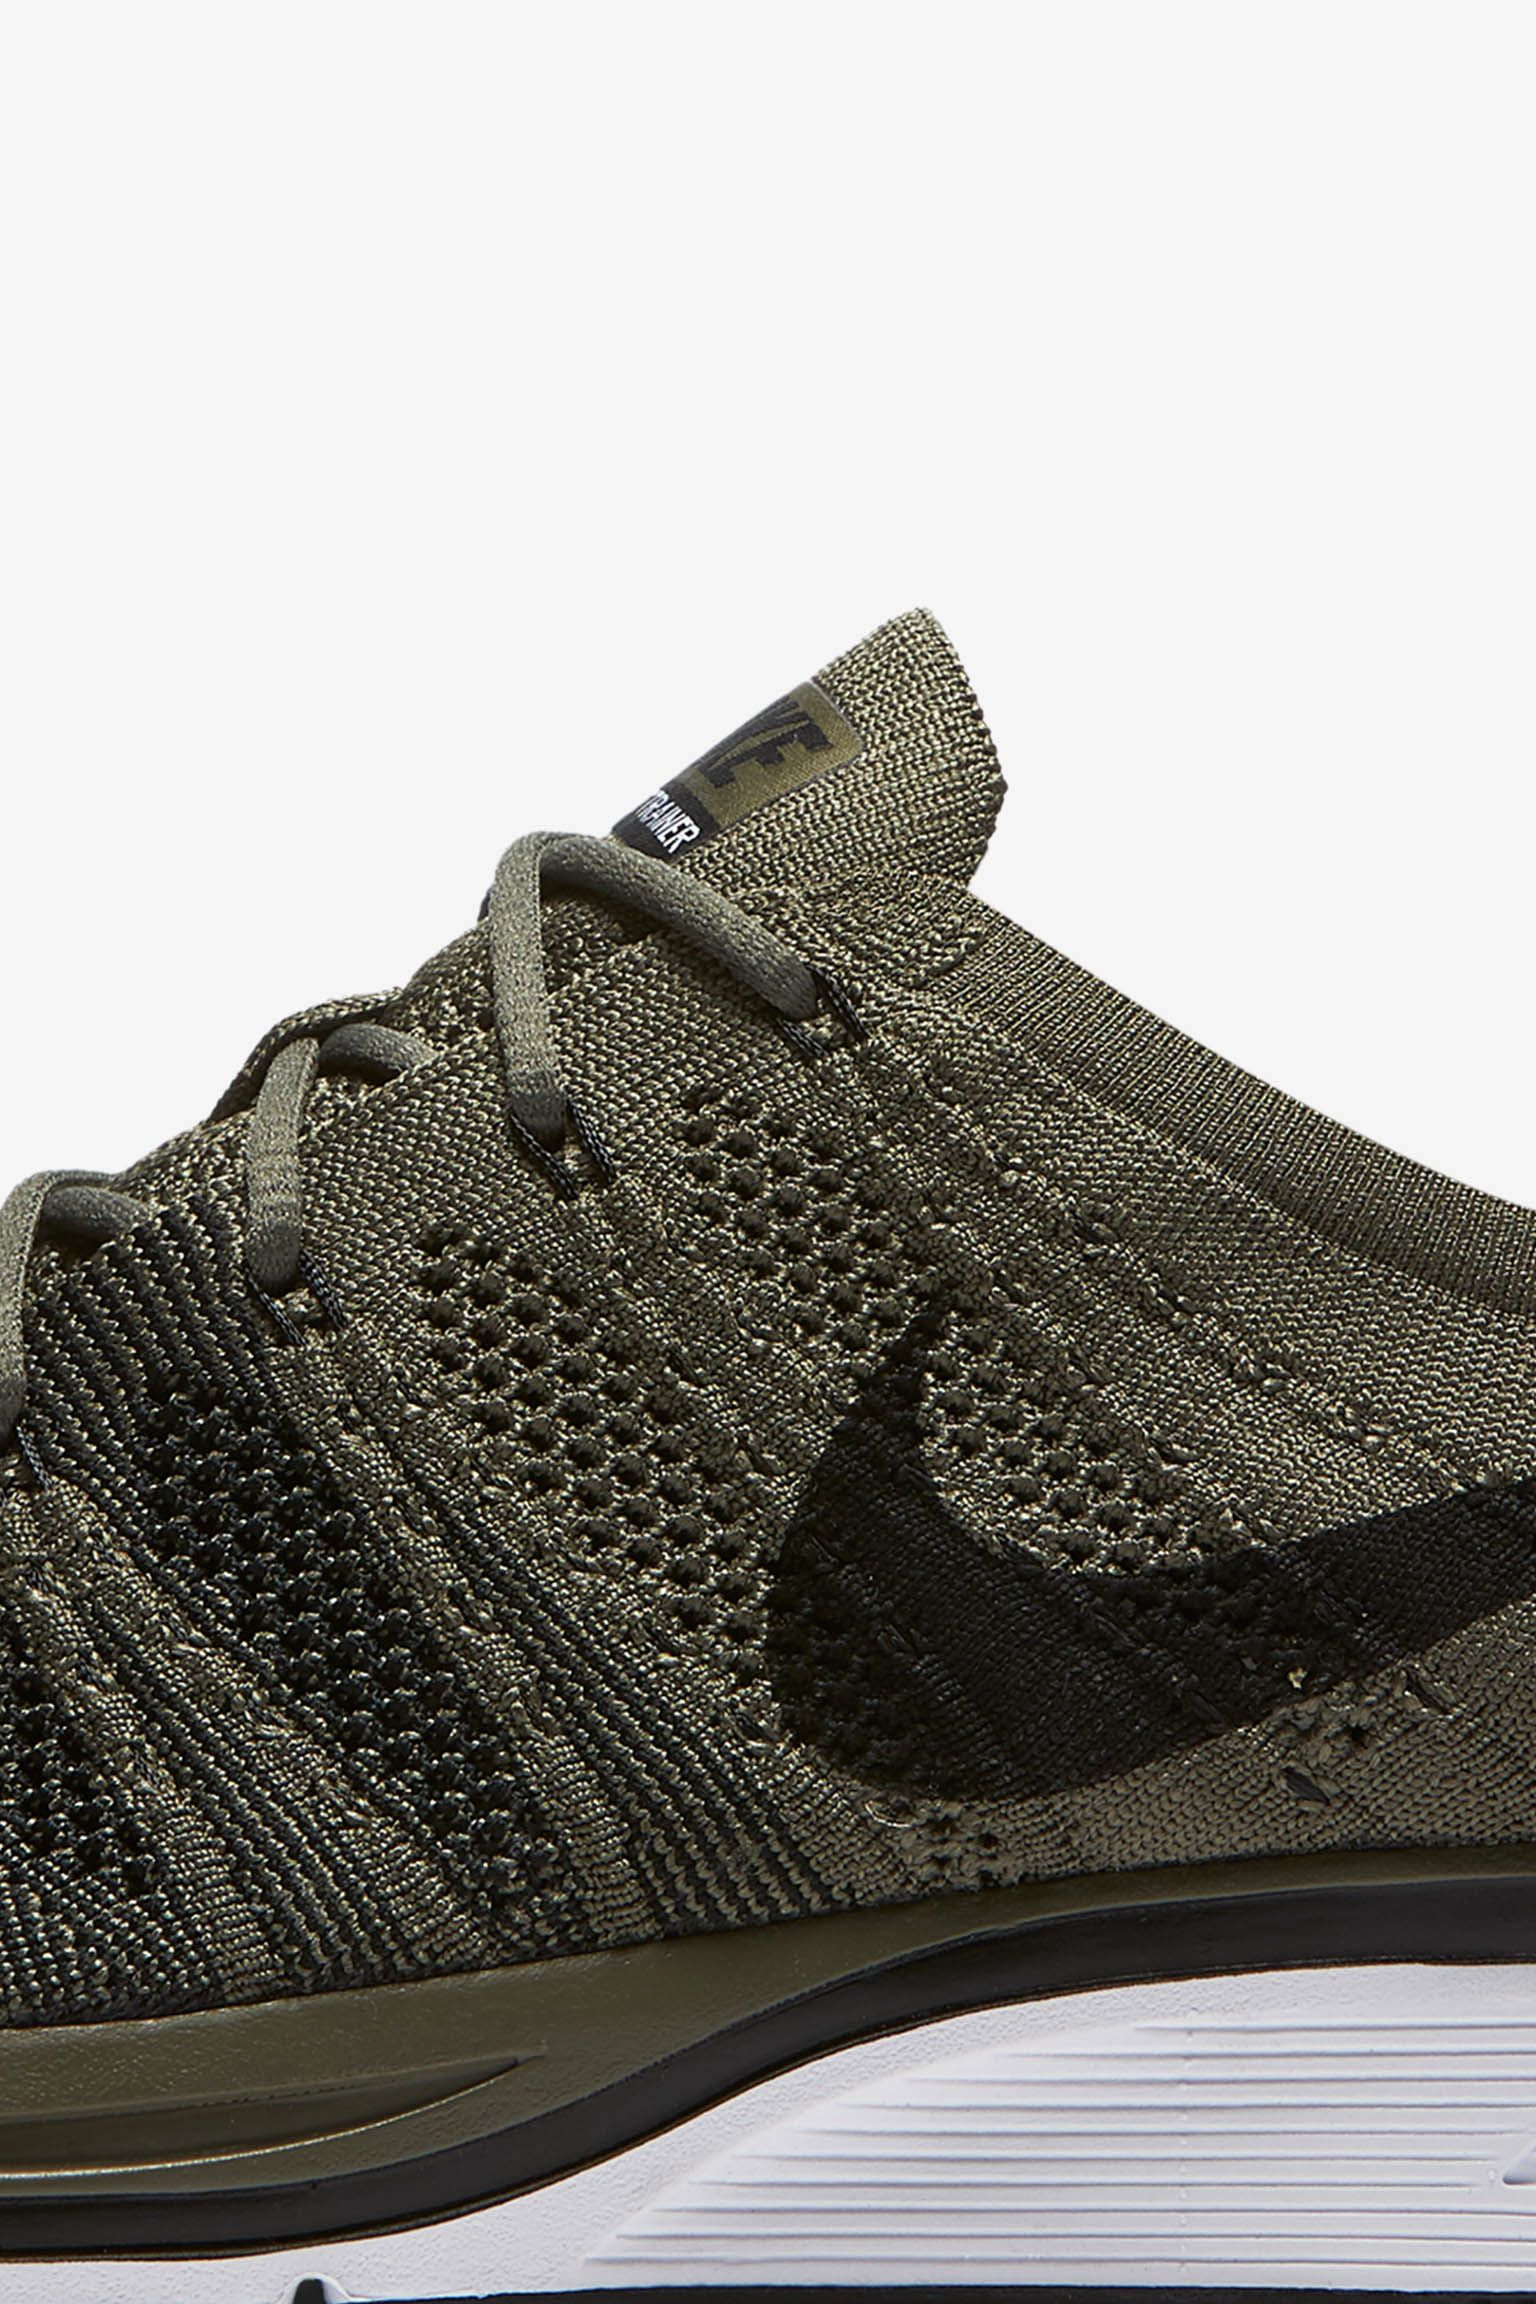 Nike Flyknit Trainer 'Light Olive & Black' Release Date